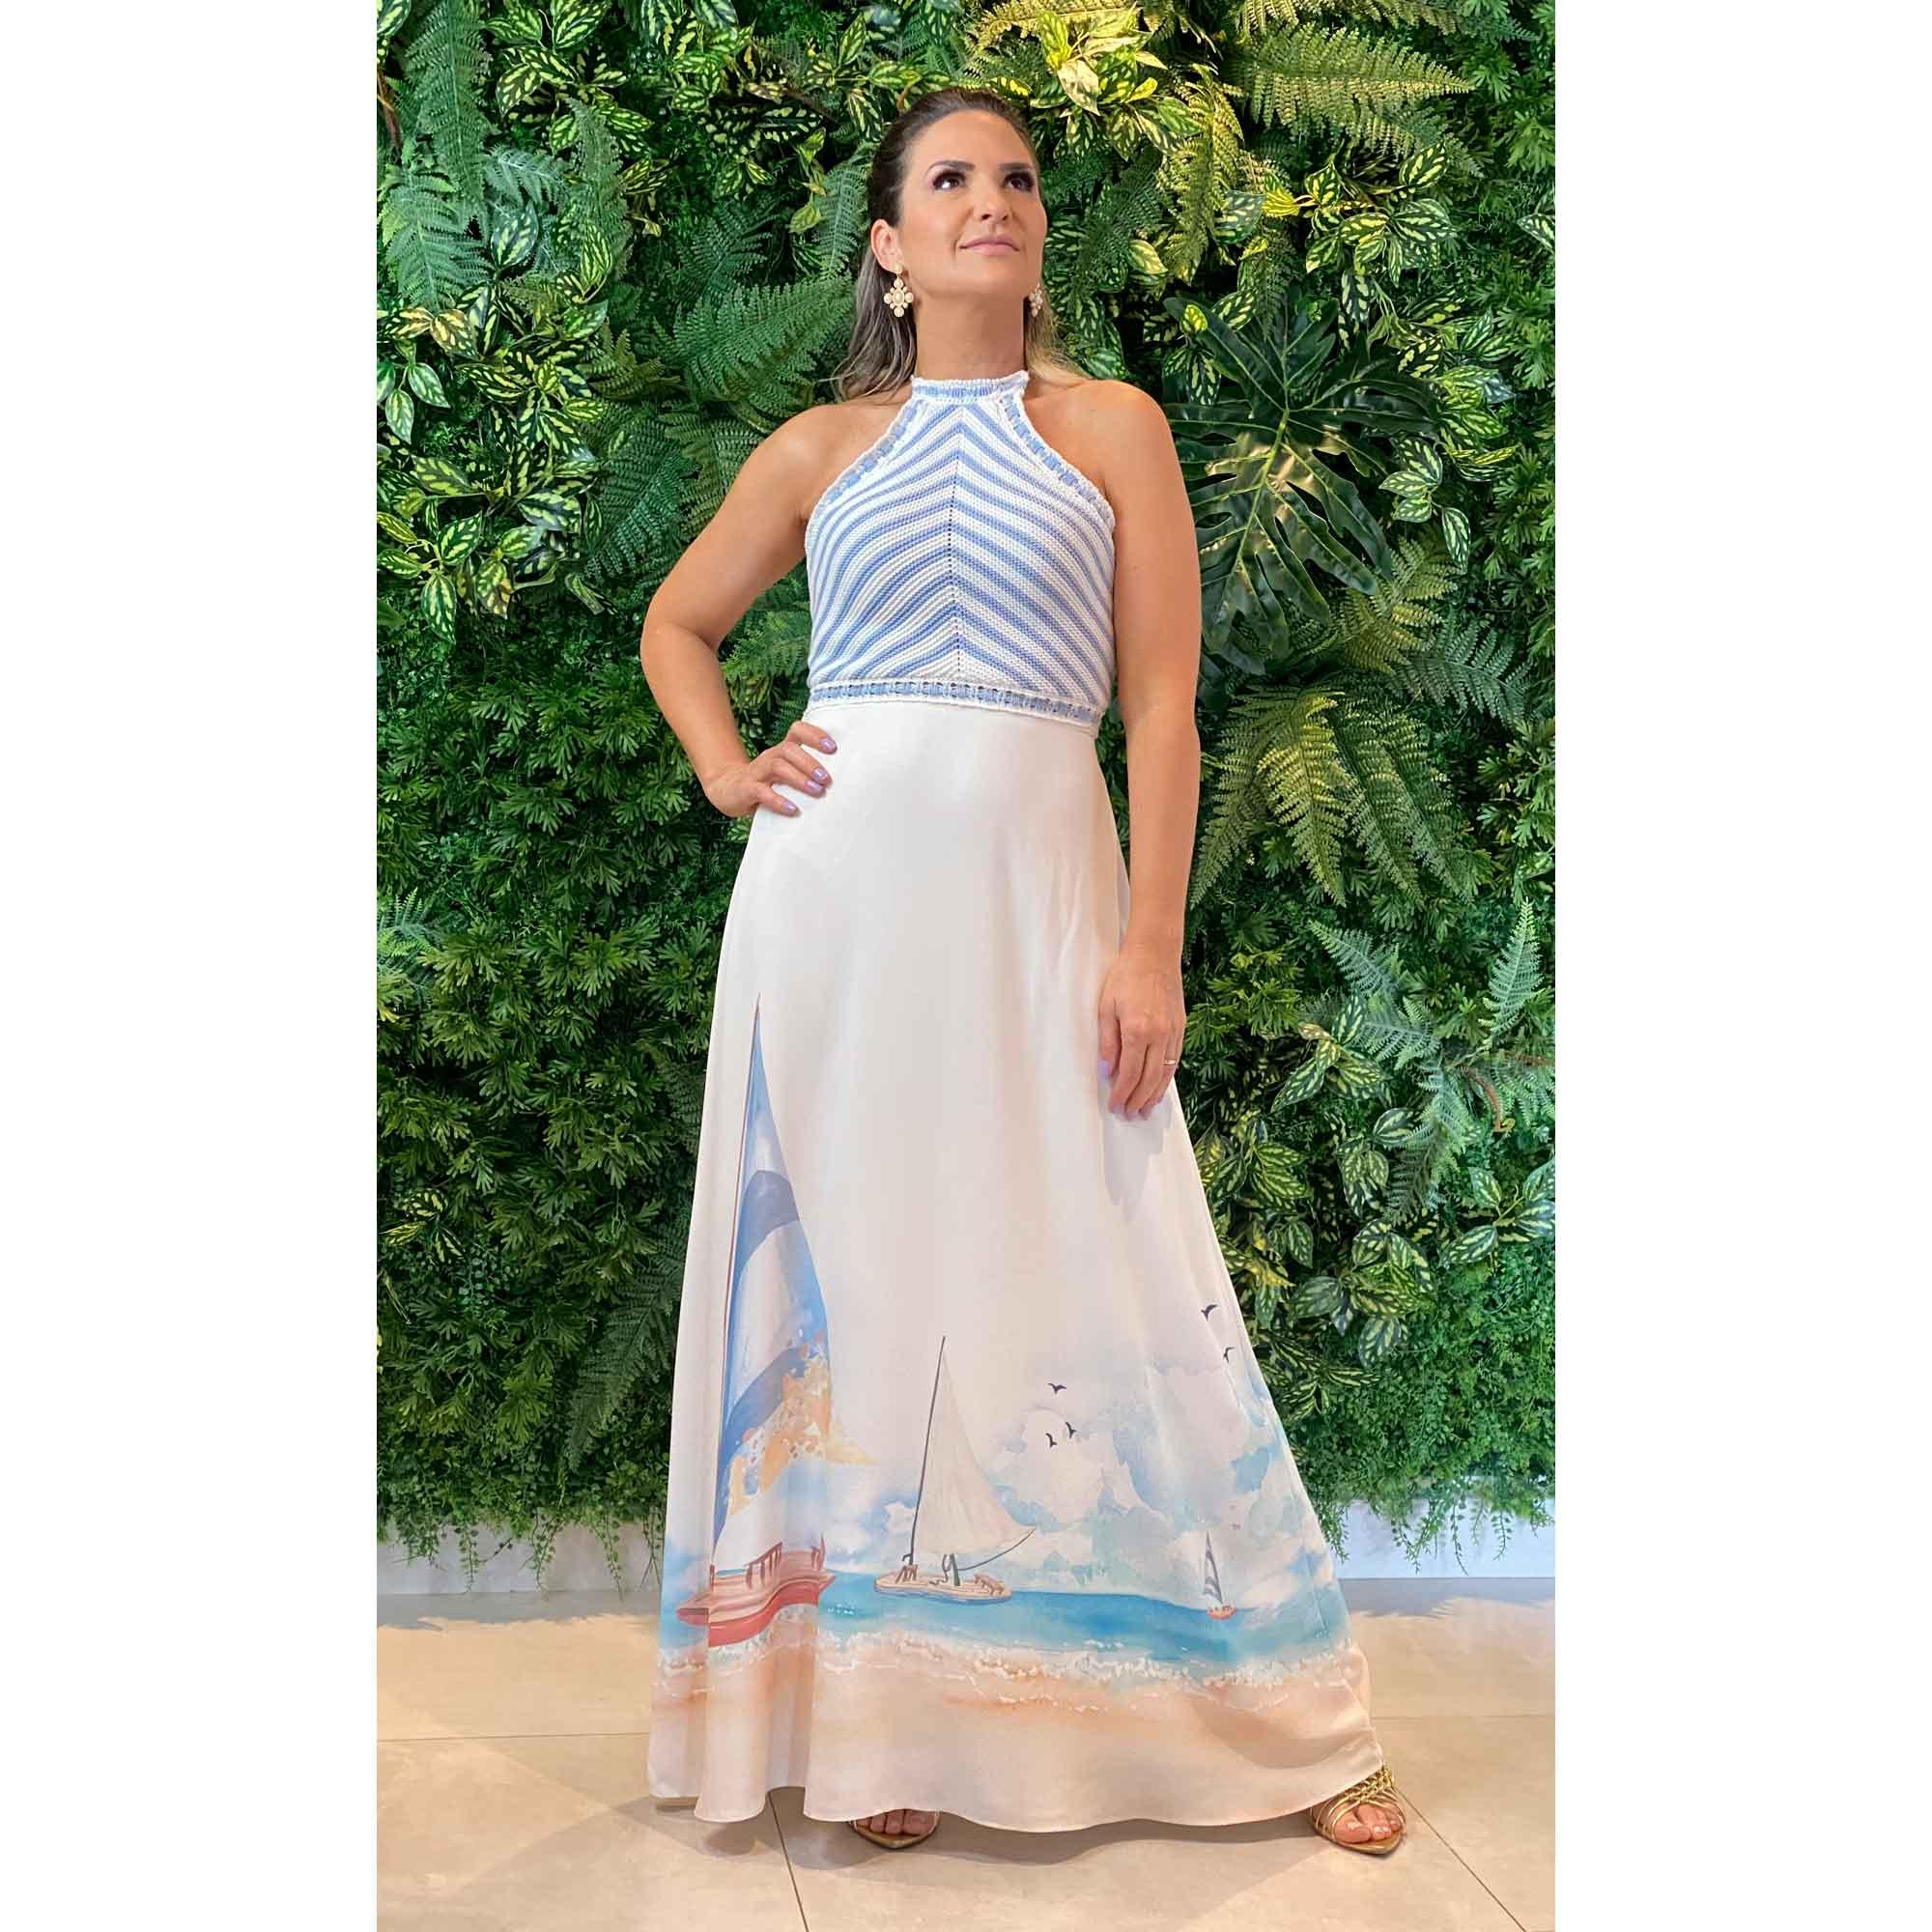 Vestido Resort com Tricot - Lez a Lez